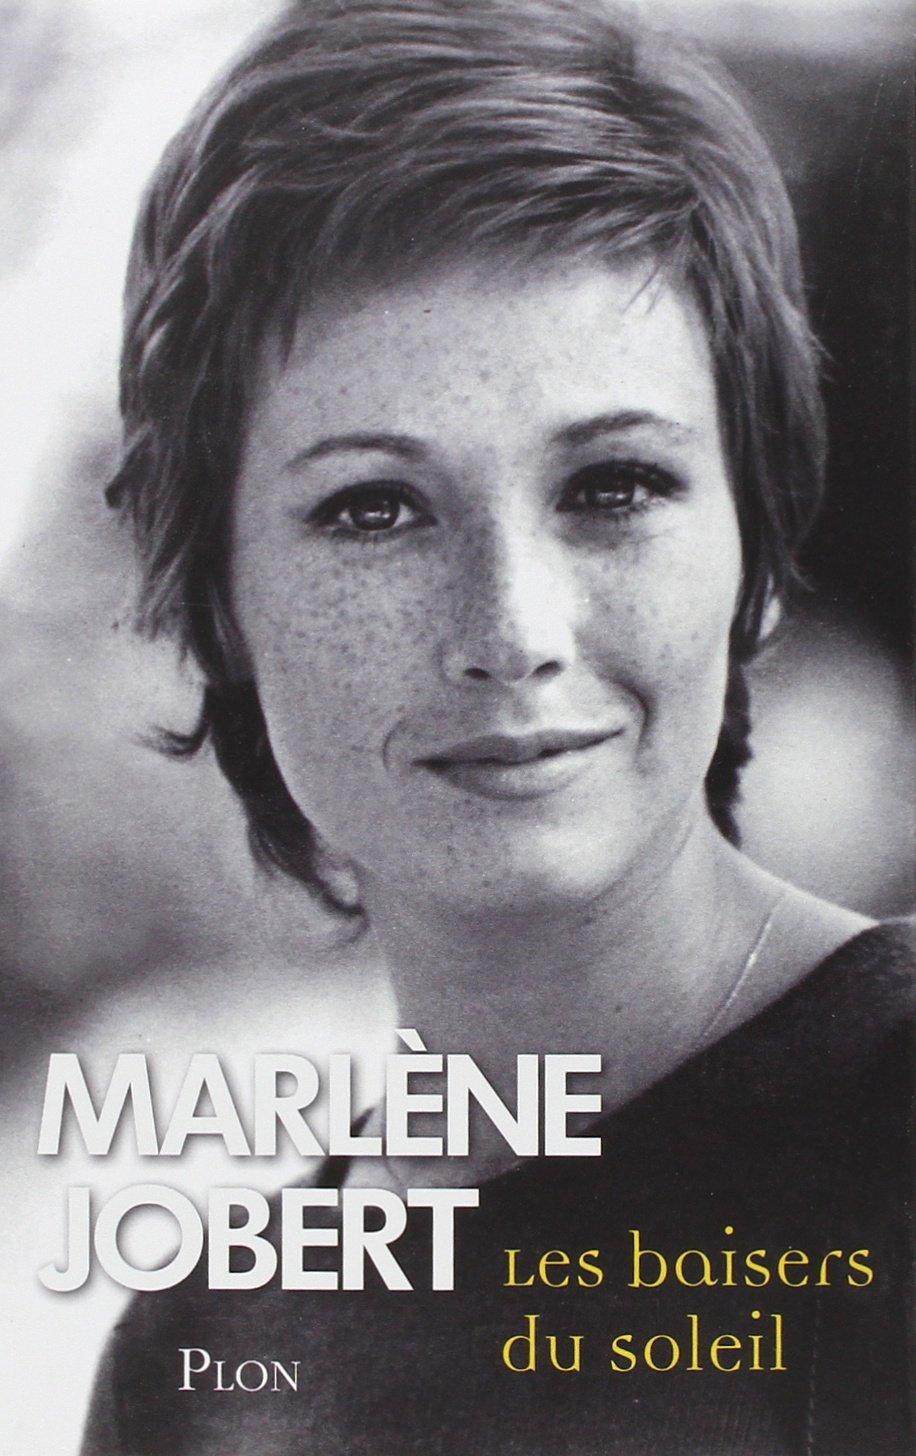 Les baisers du soleil - Marlène Jobert